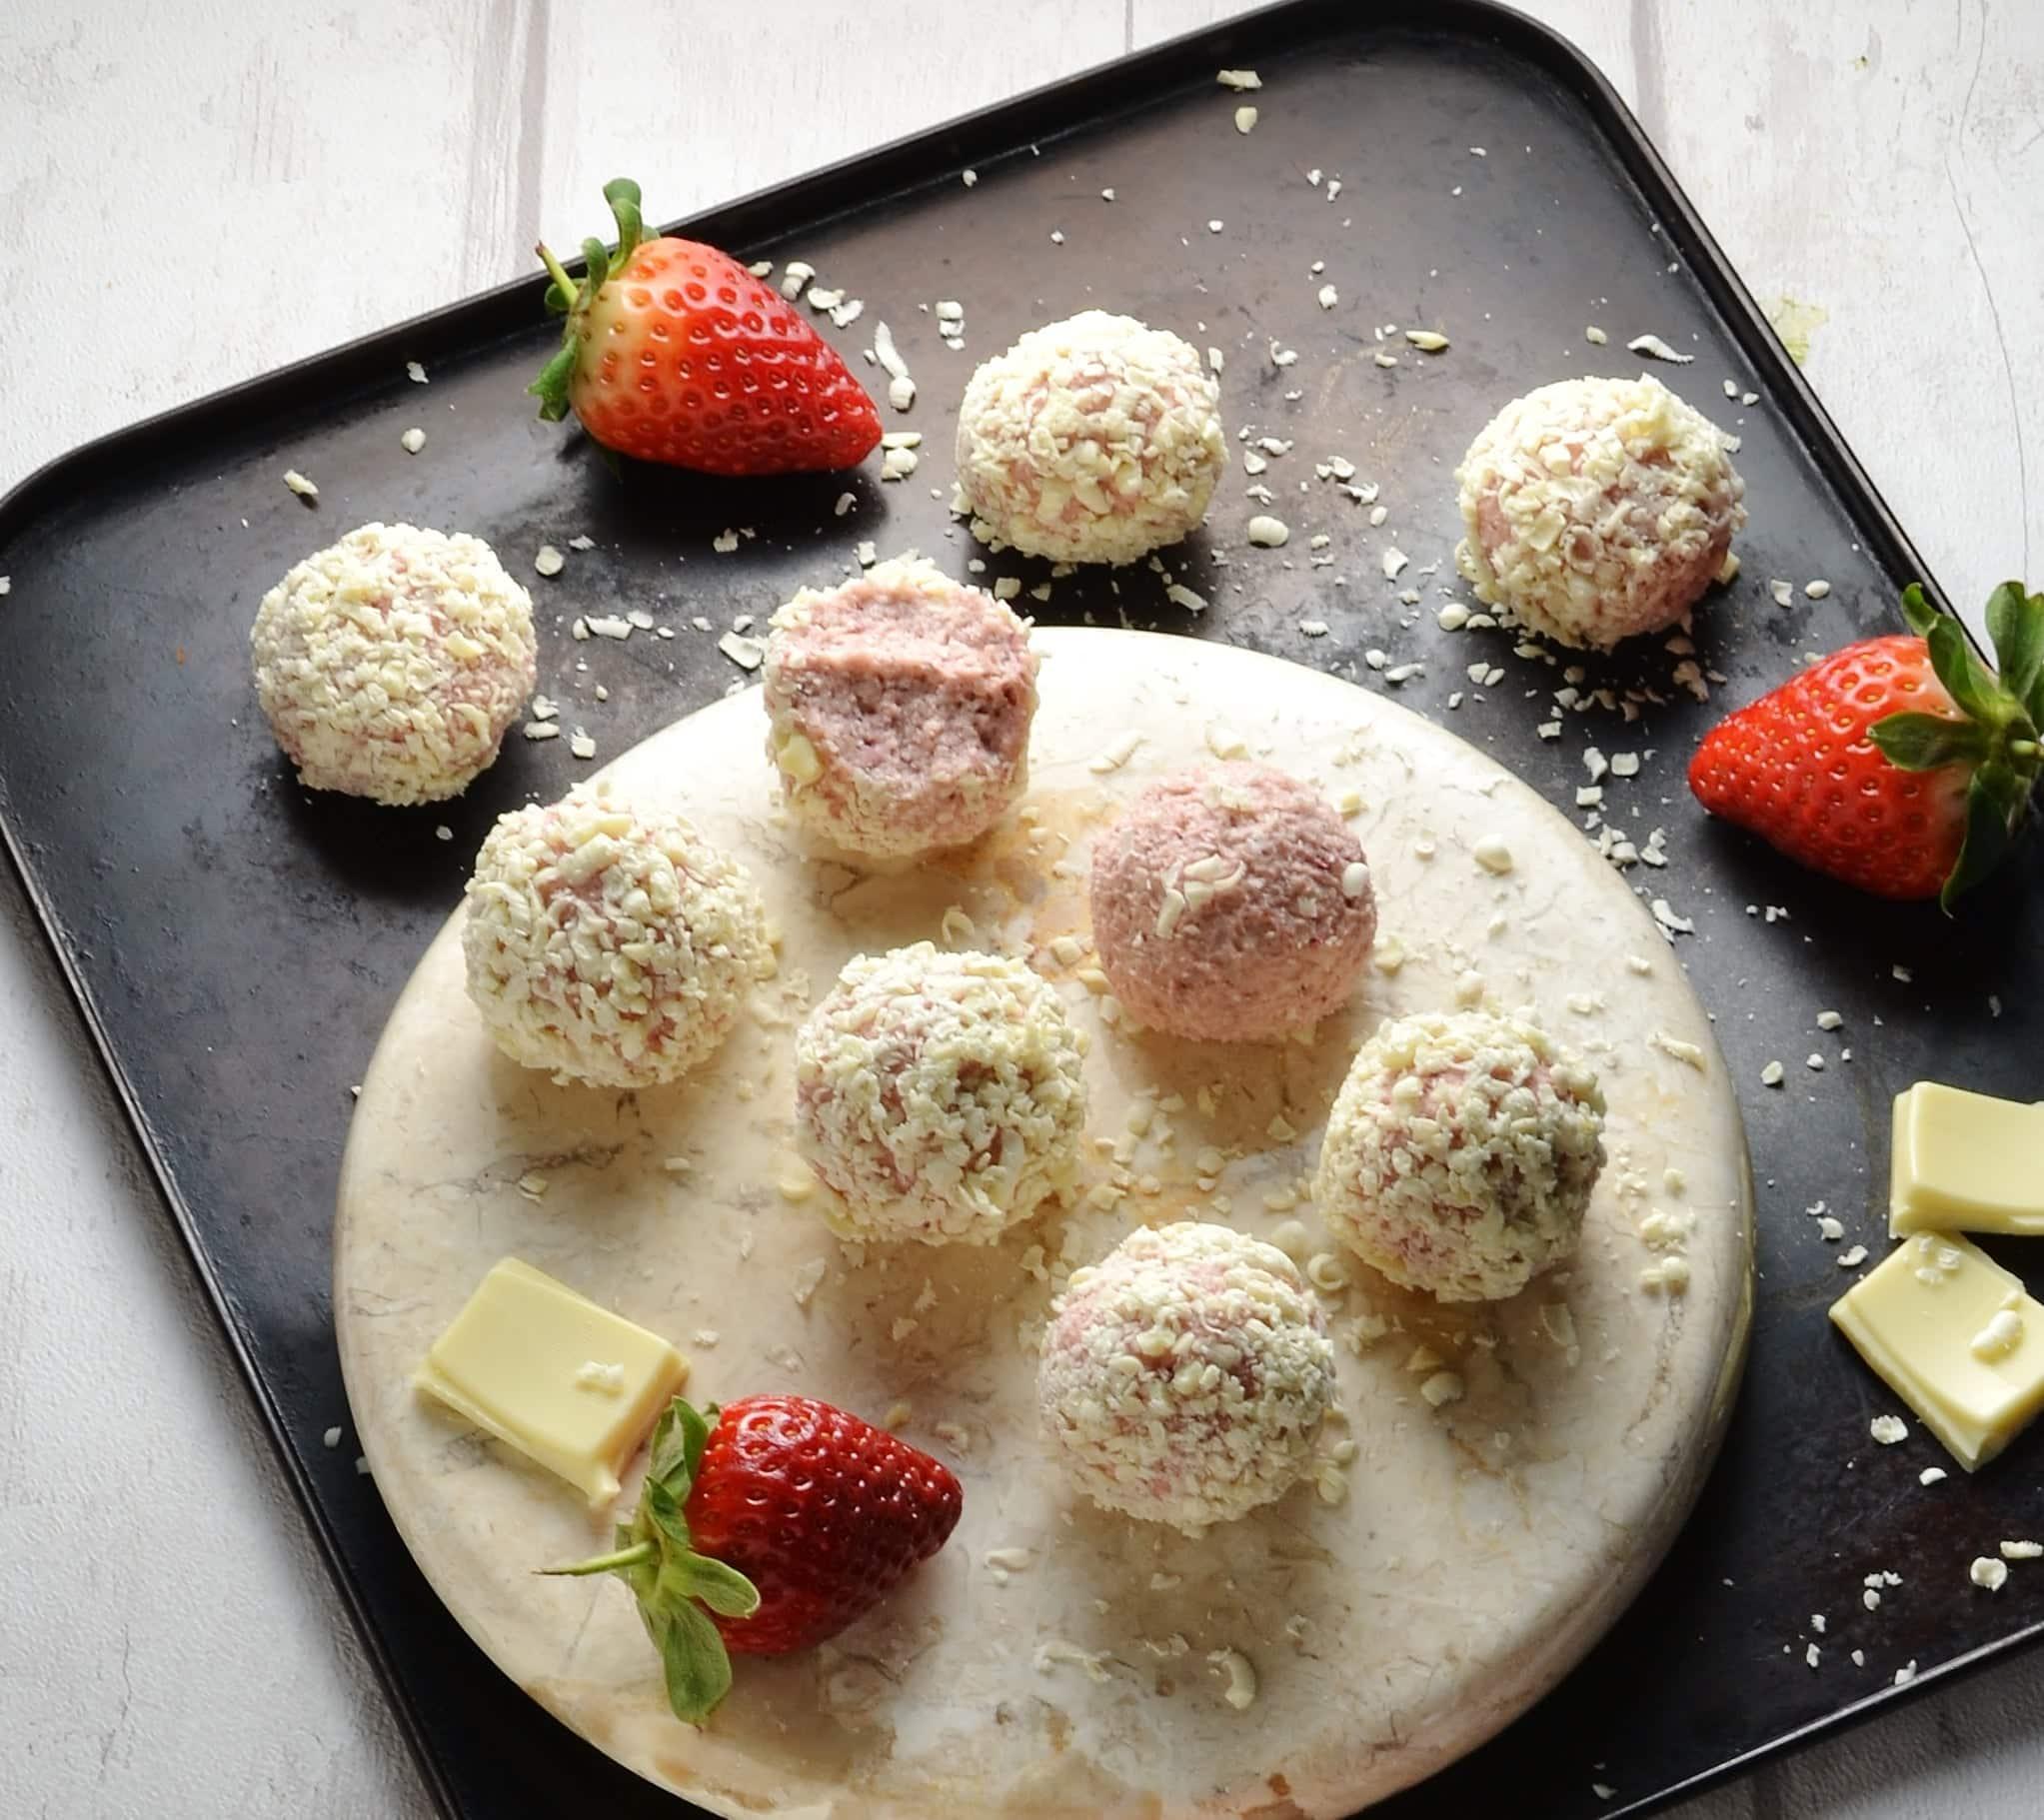 Healthy Strawberry Cheesecake Bites with White Chocolate